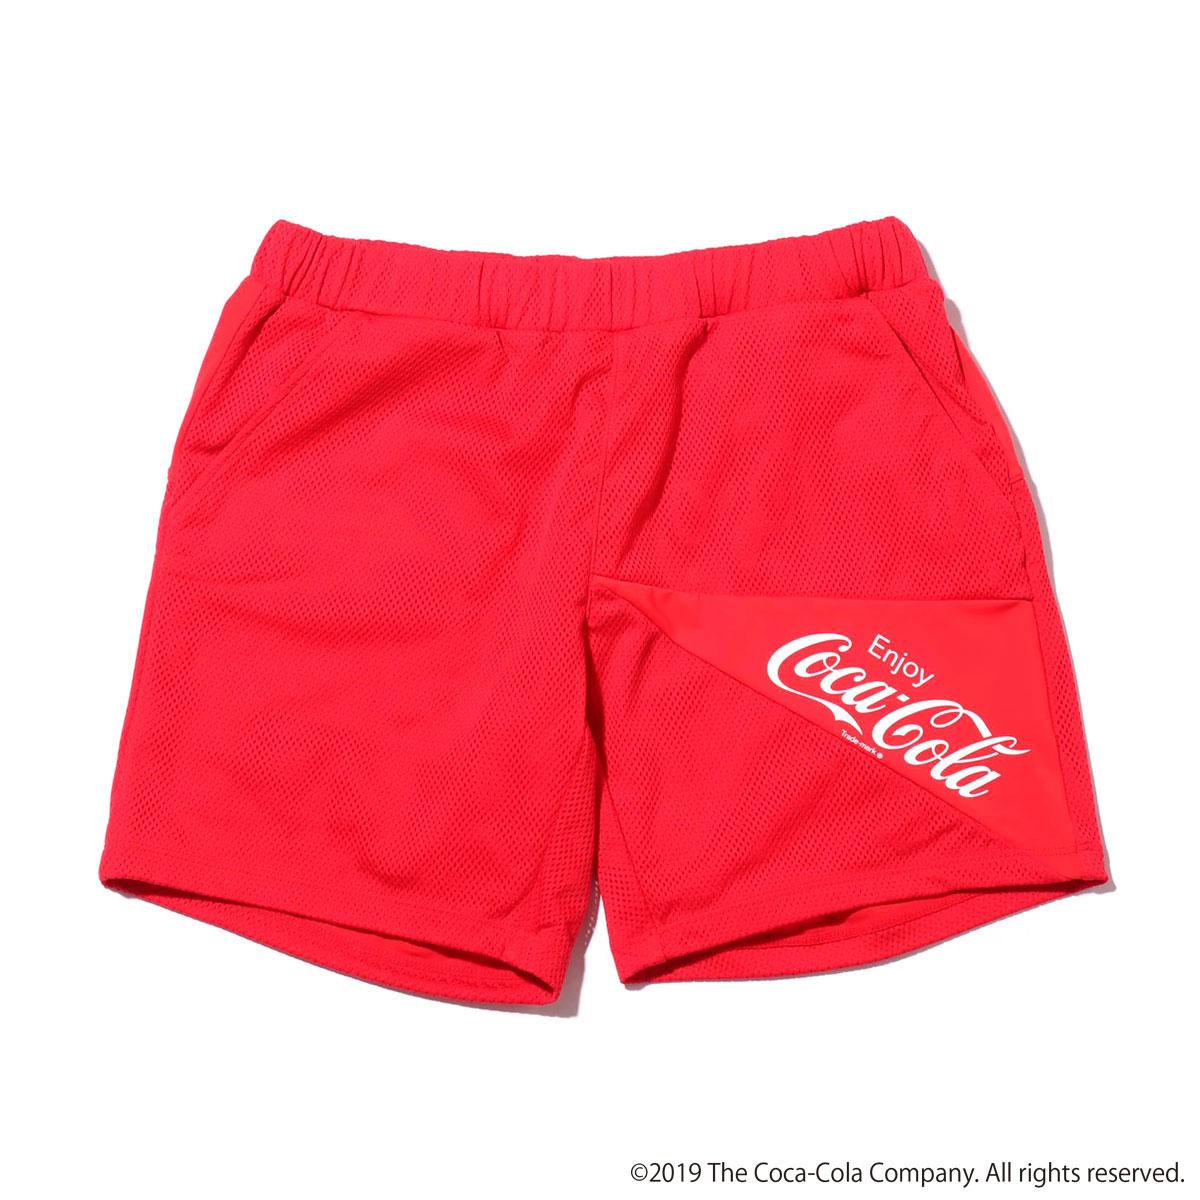 GUACAMOLE GUACAmos COCA-COLA mens pants(ガカモレ ガカモス コカ・コーラ メンズパンツ)RED【メンズ 水着】19SS-S